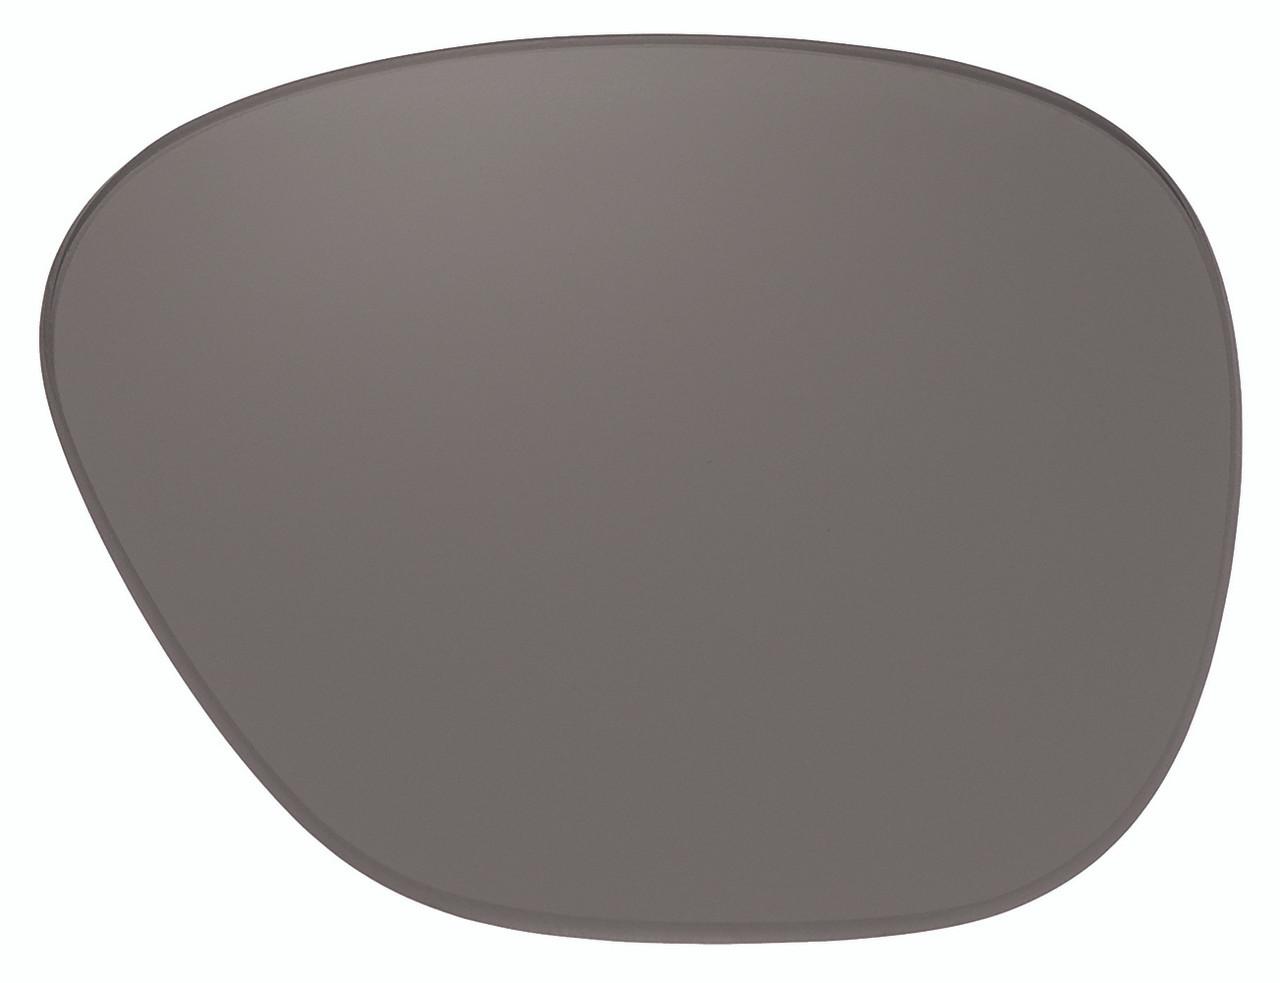 Suncloud Optics Mosaic Authentic Replacement Polarized Lenses